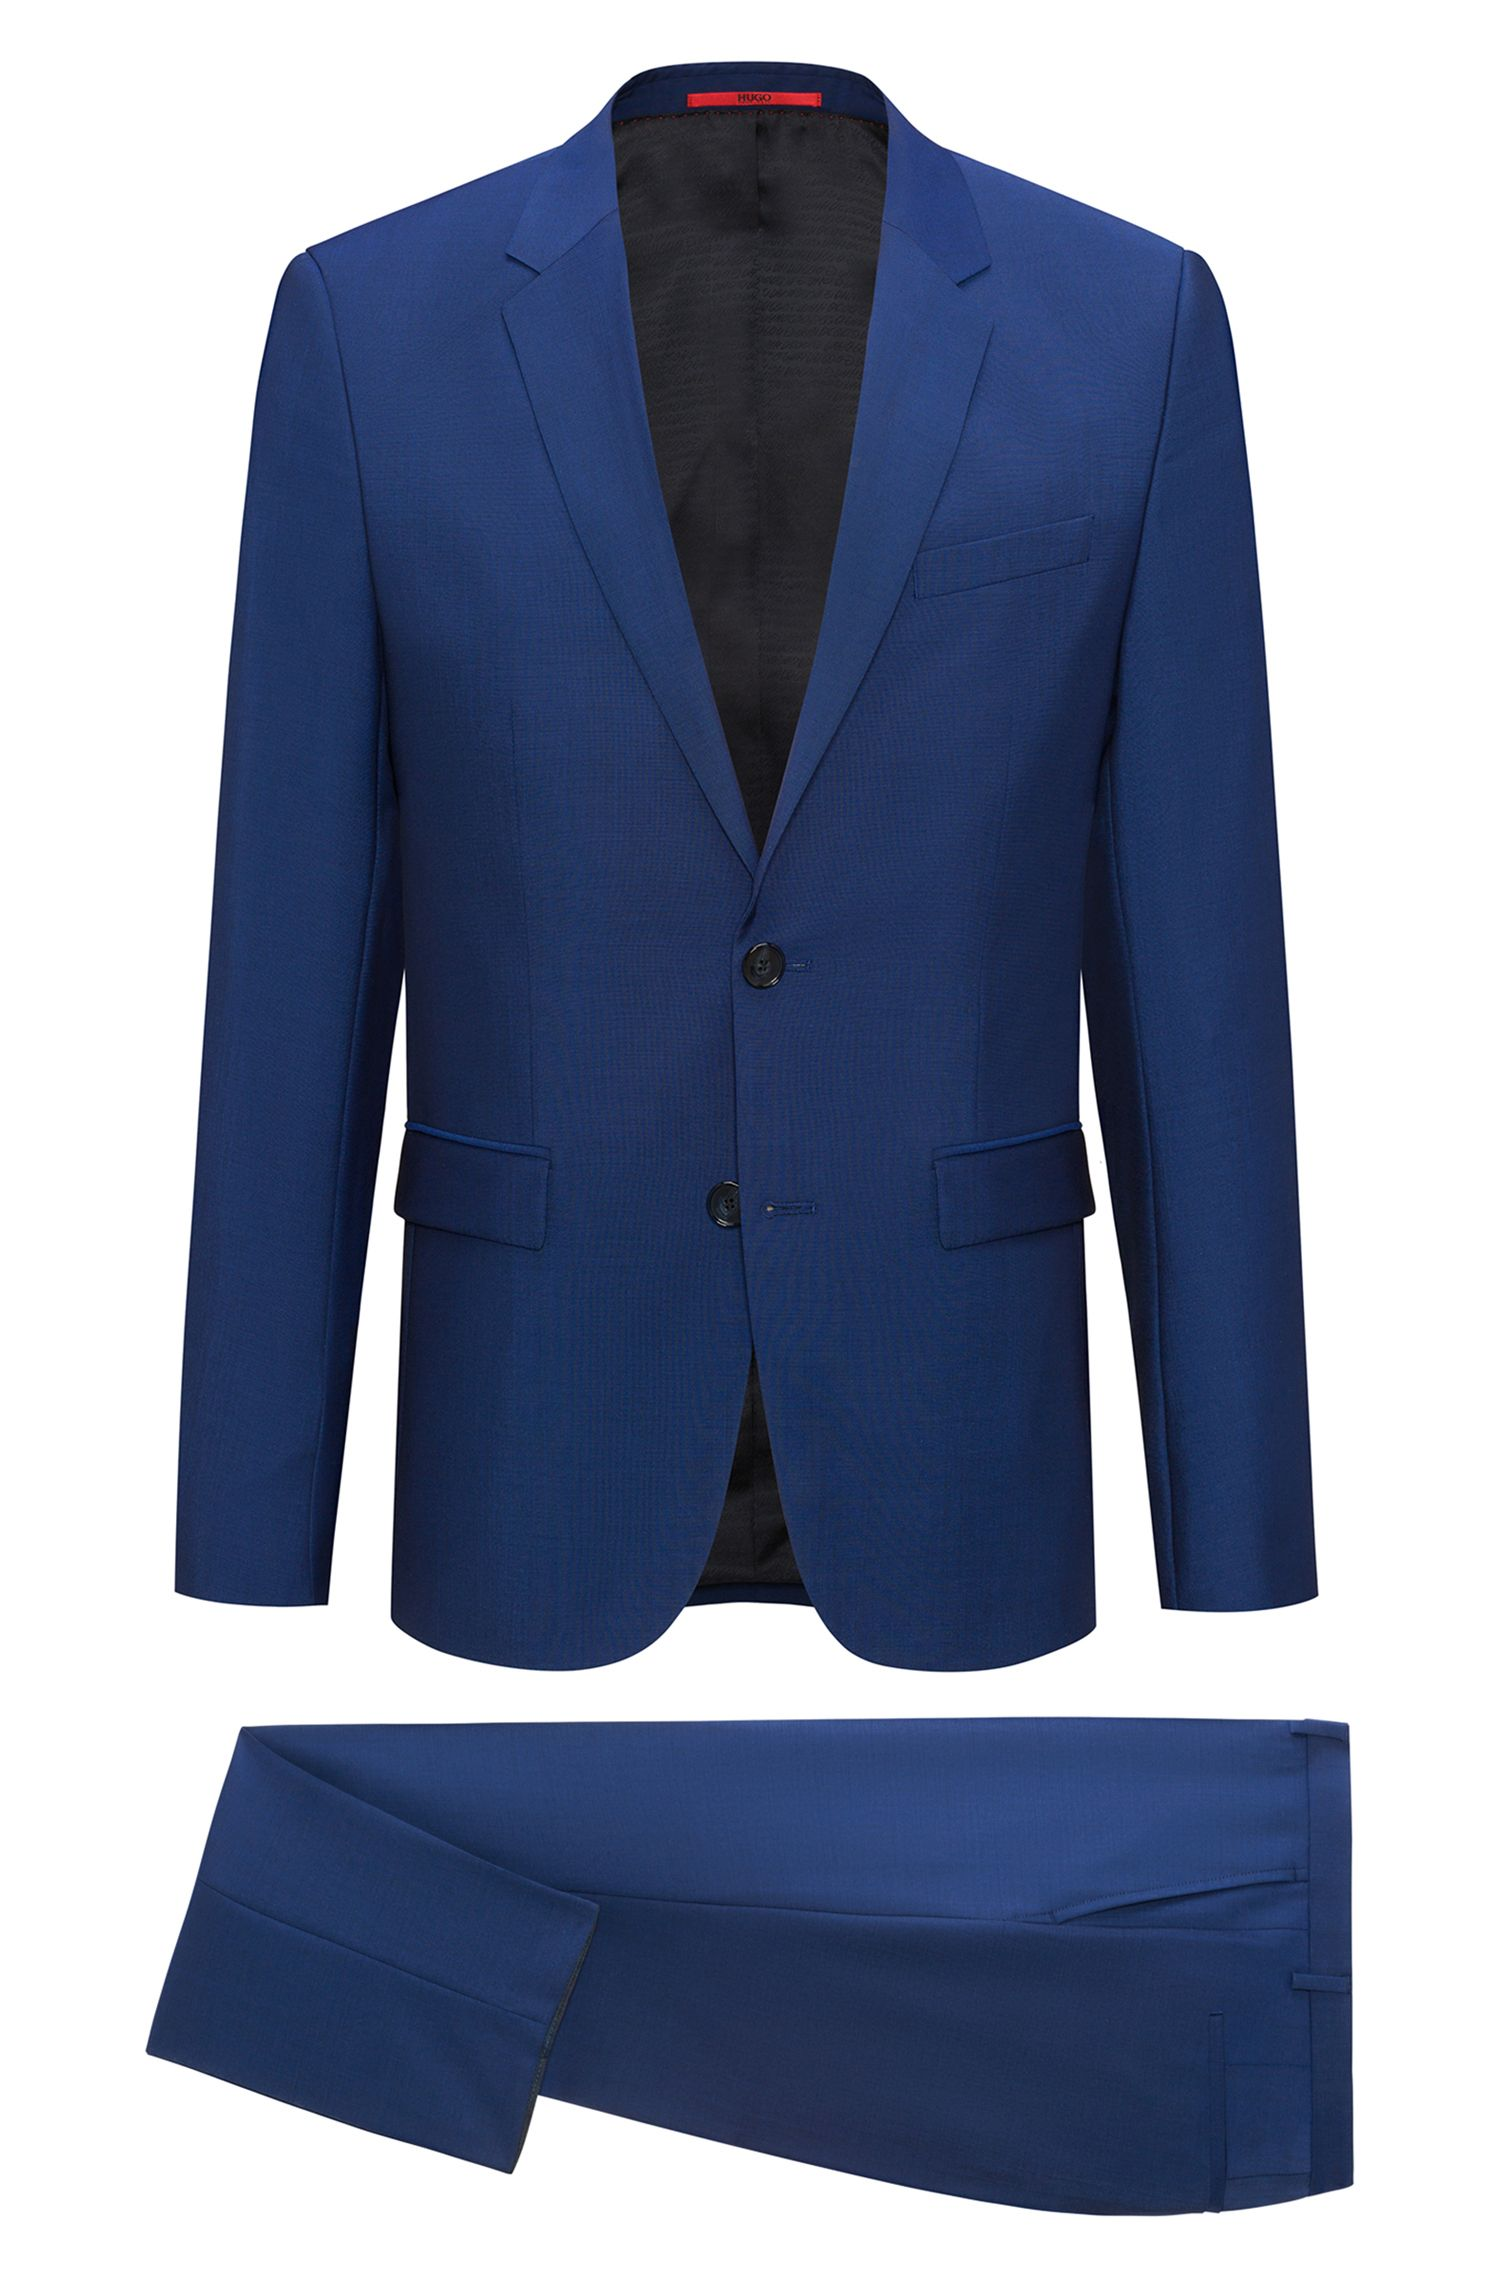 Wool Mohair Suit, Extra Slim Fit | Arti/Hesten